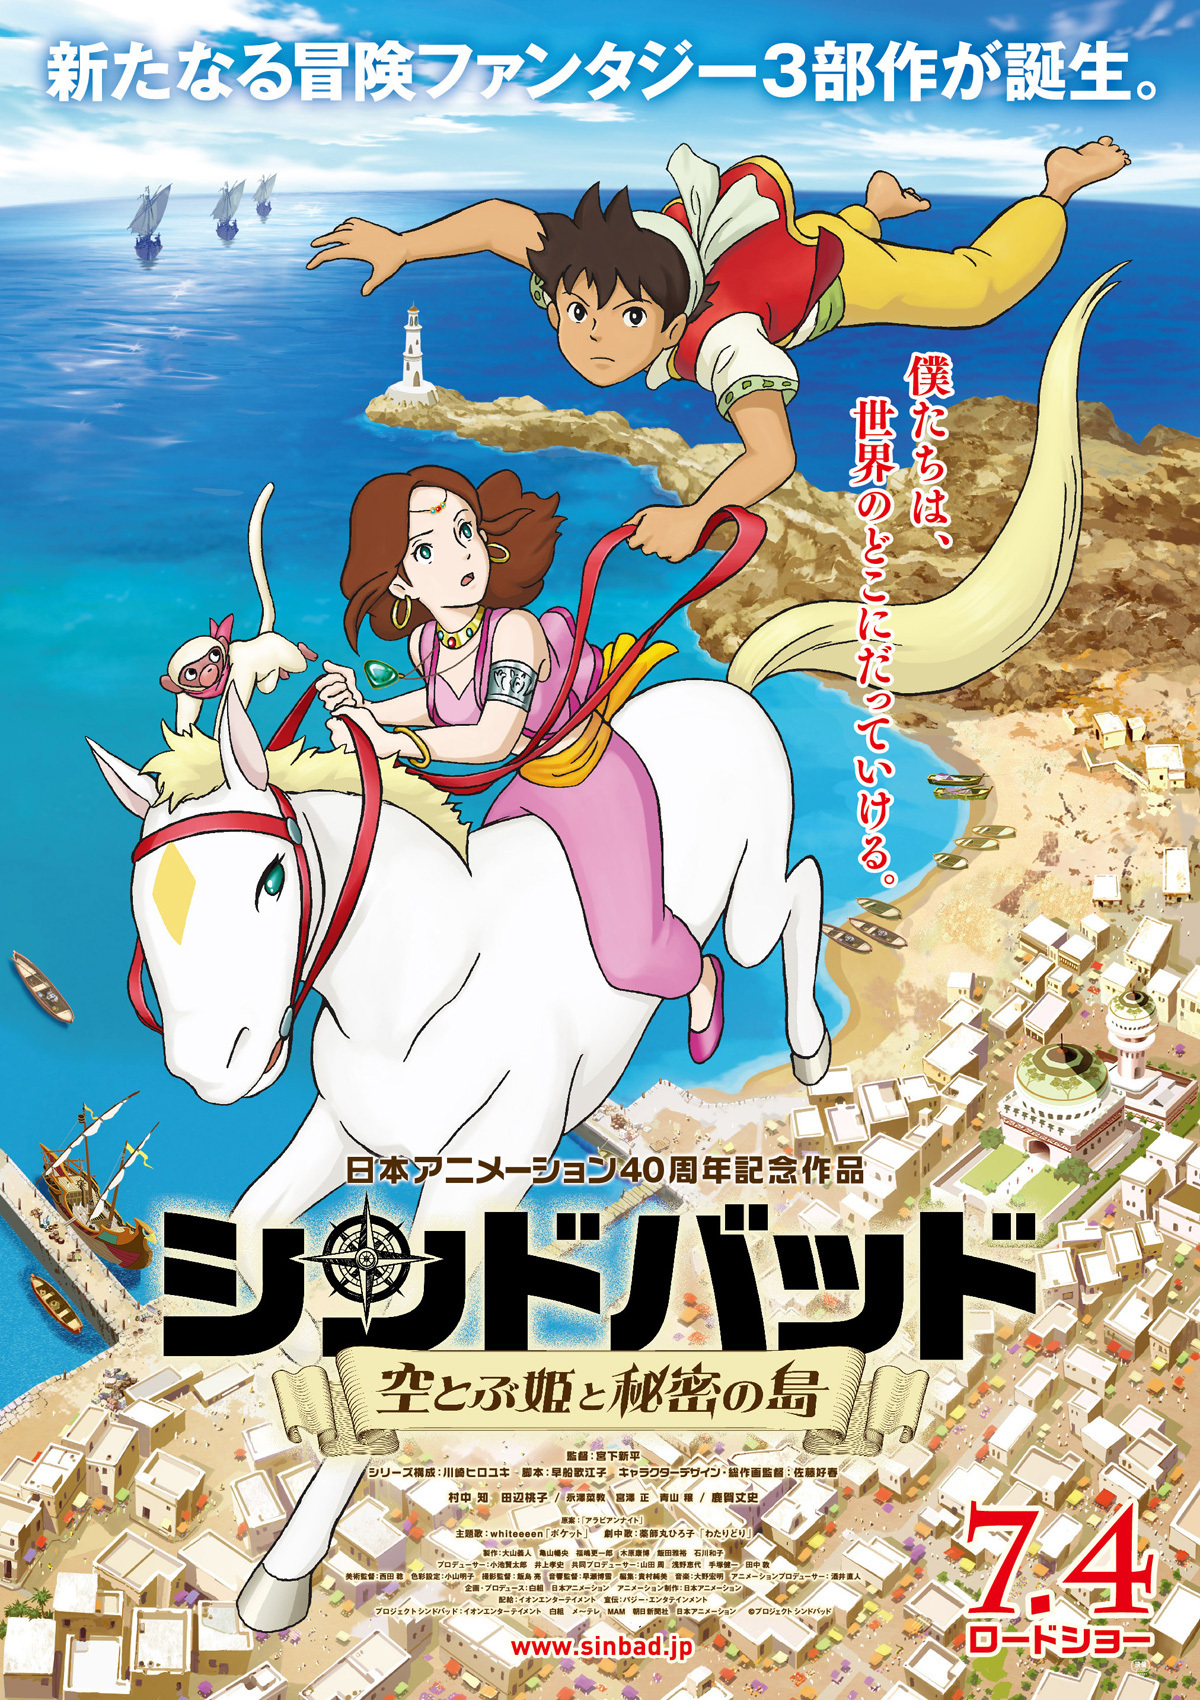 Sinbad: The Flying Princess and the Secret Island Part 1 (2015) - IMDb